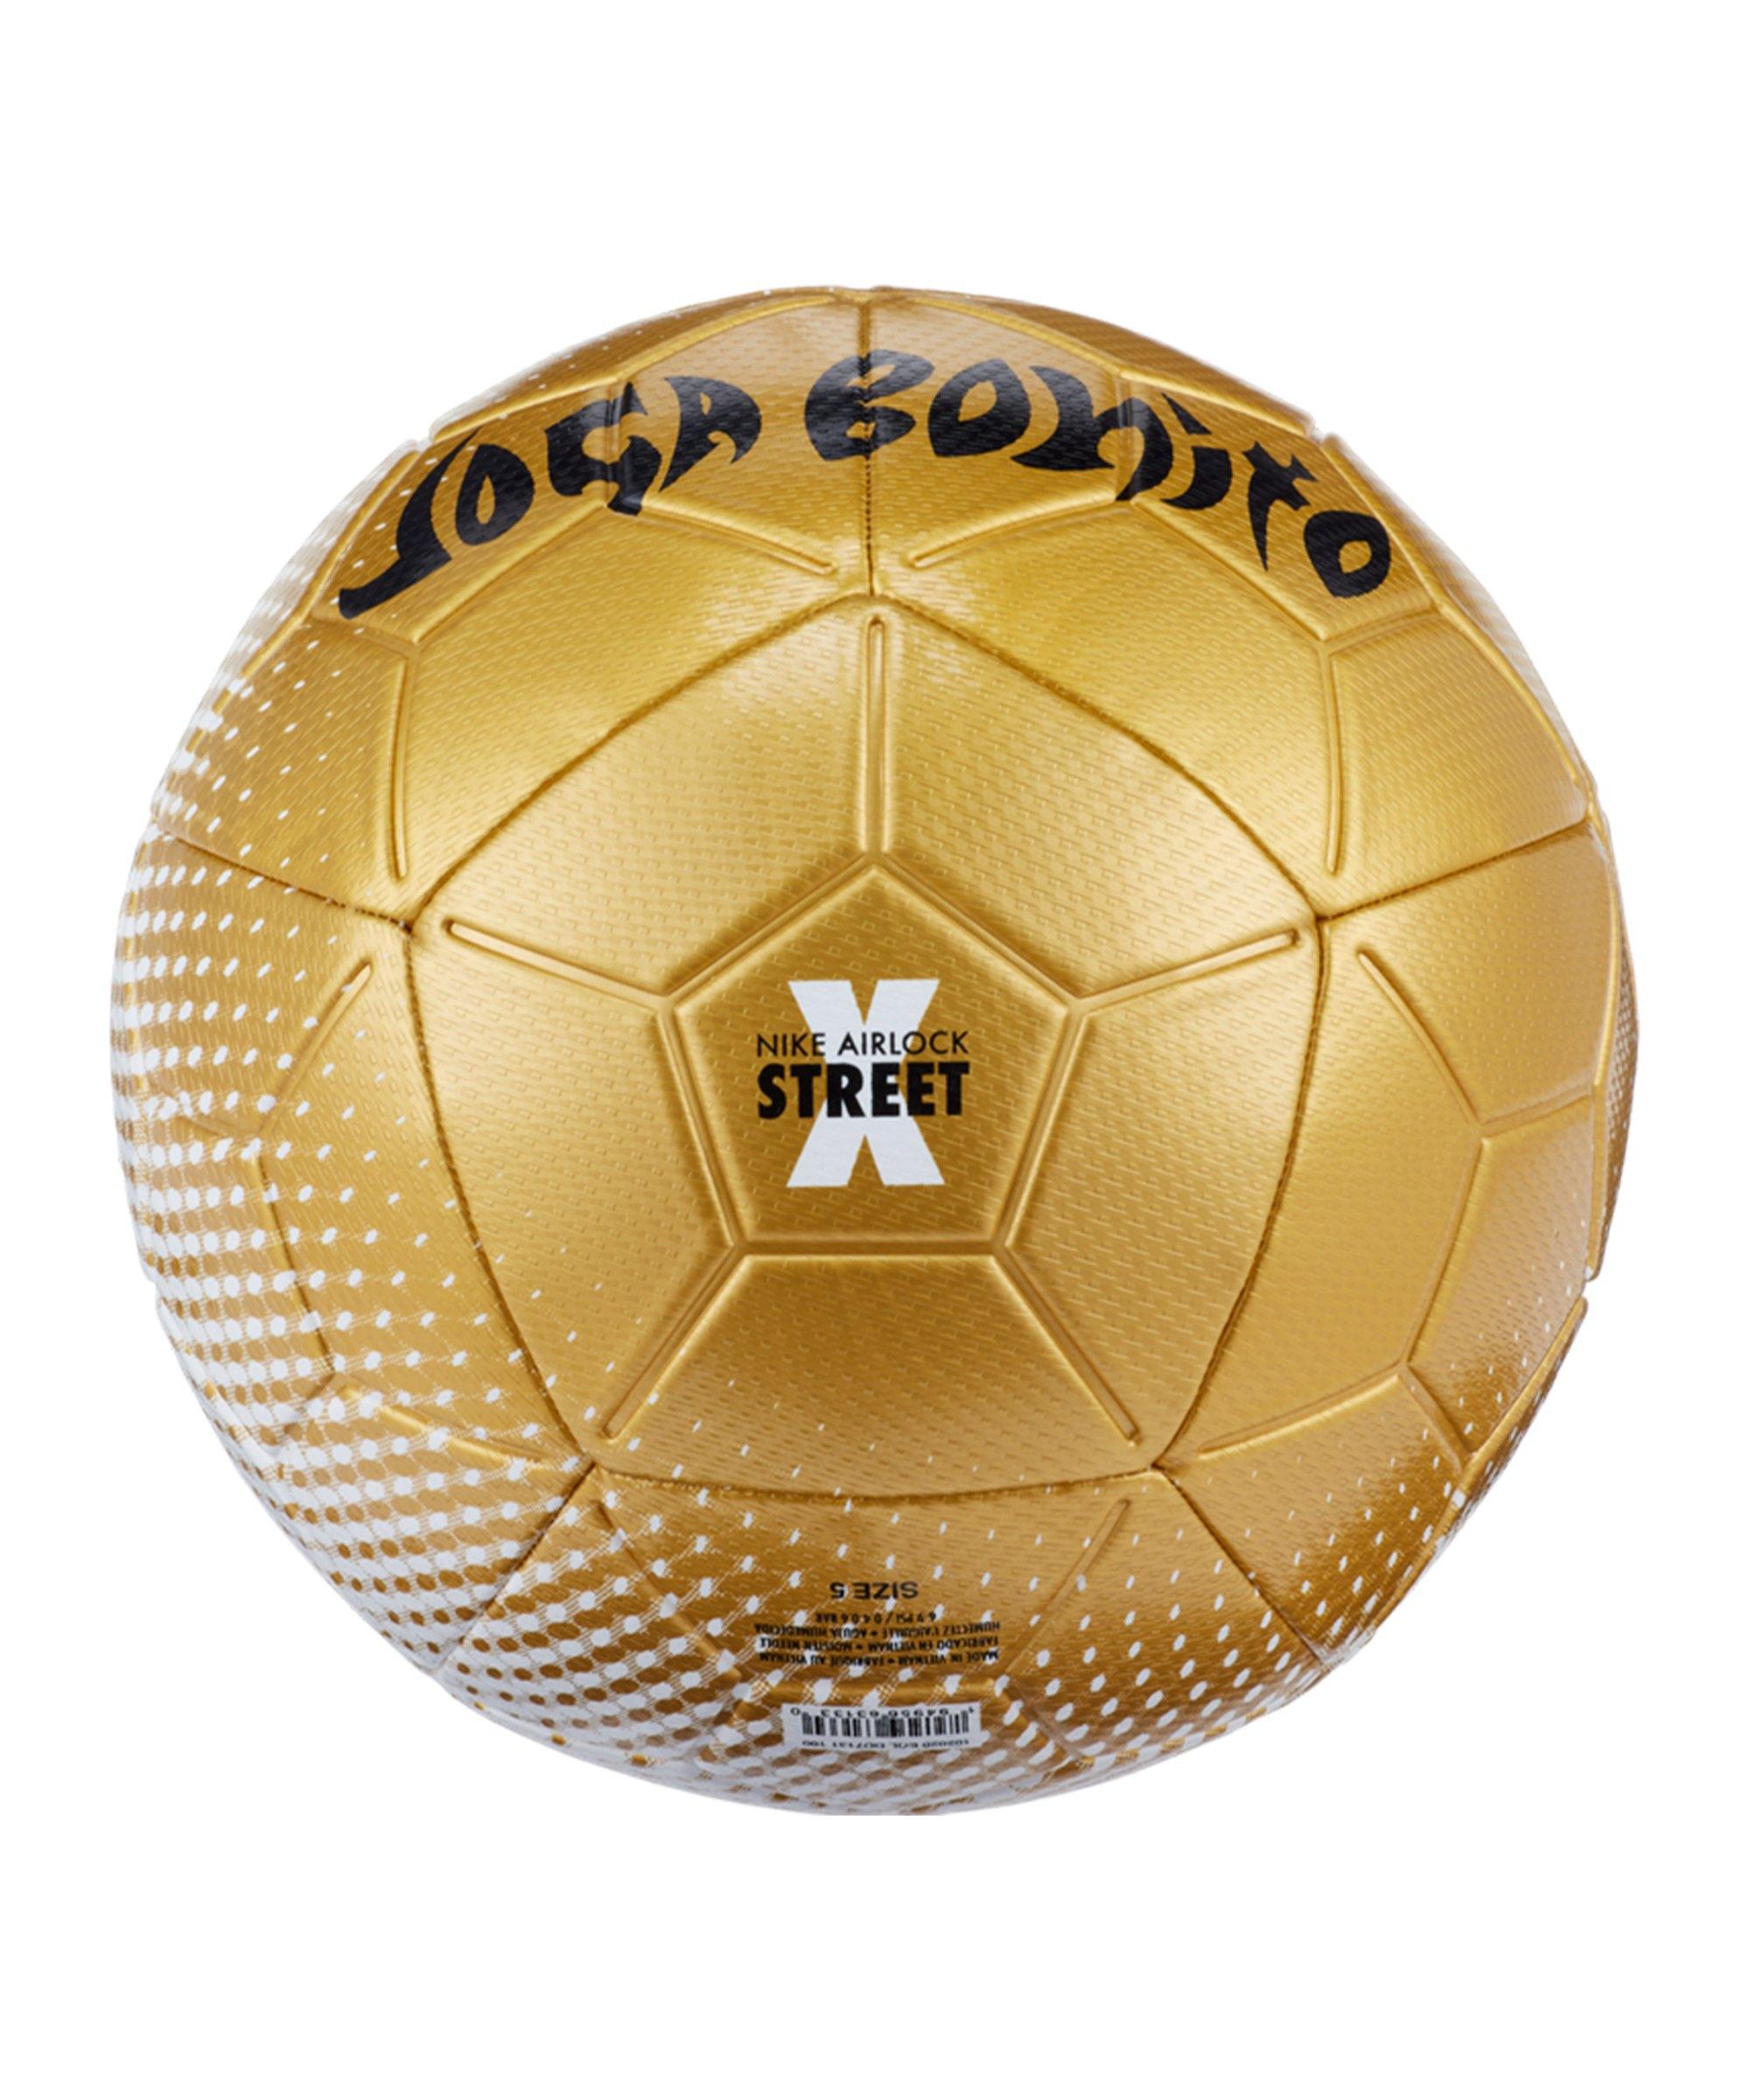 Nike Airlock Street X Joga Bonito Schwarz F100 - gold